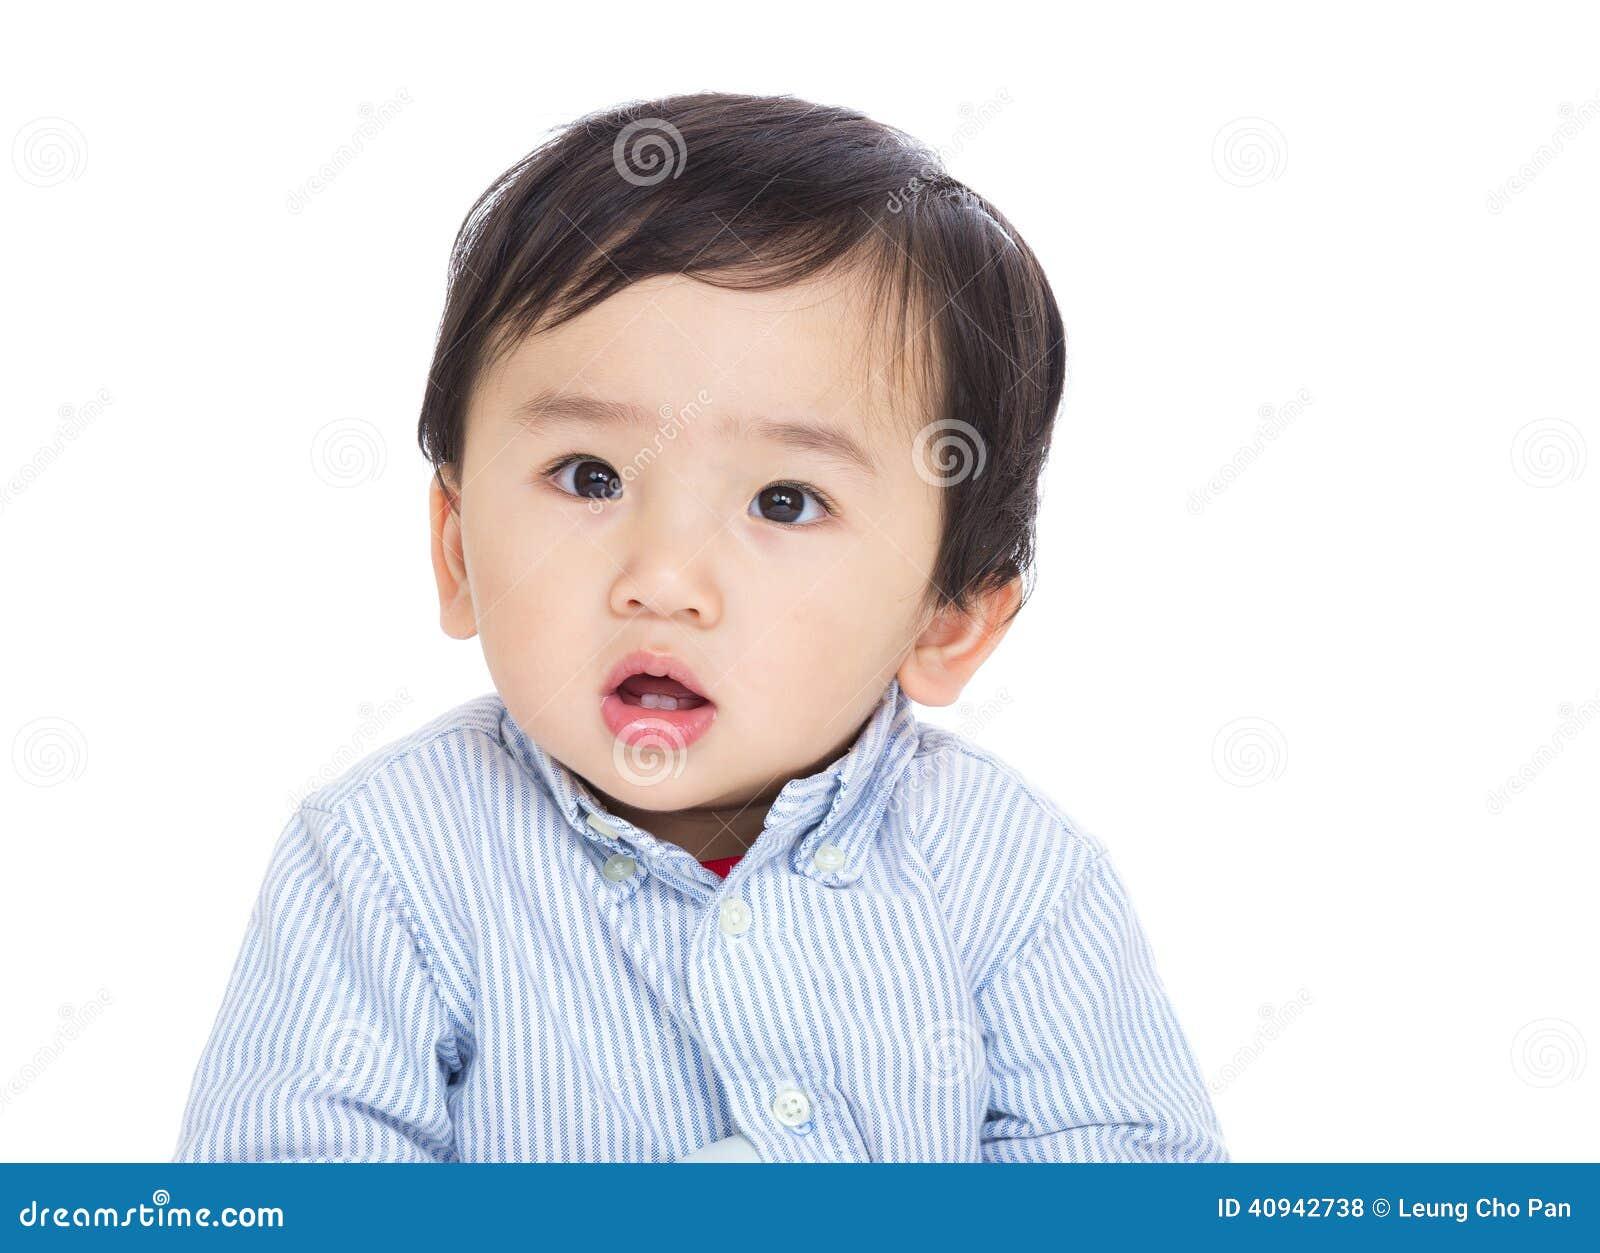 Asian Baby Boy Stock Photo - Image: 40942738